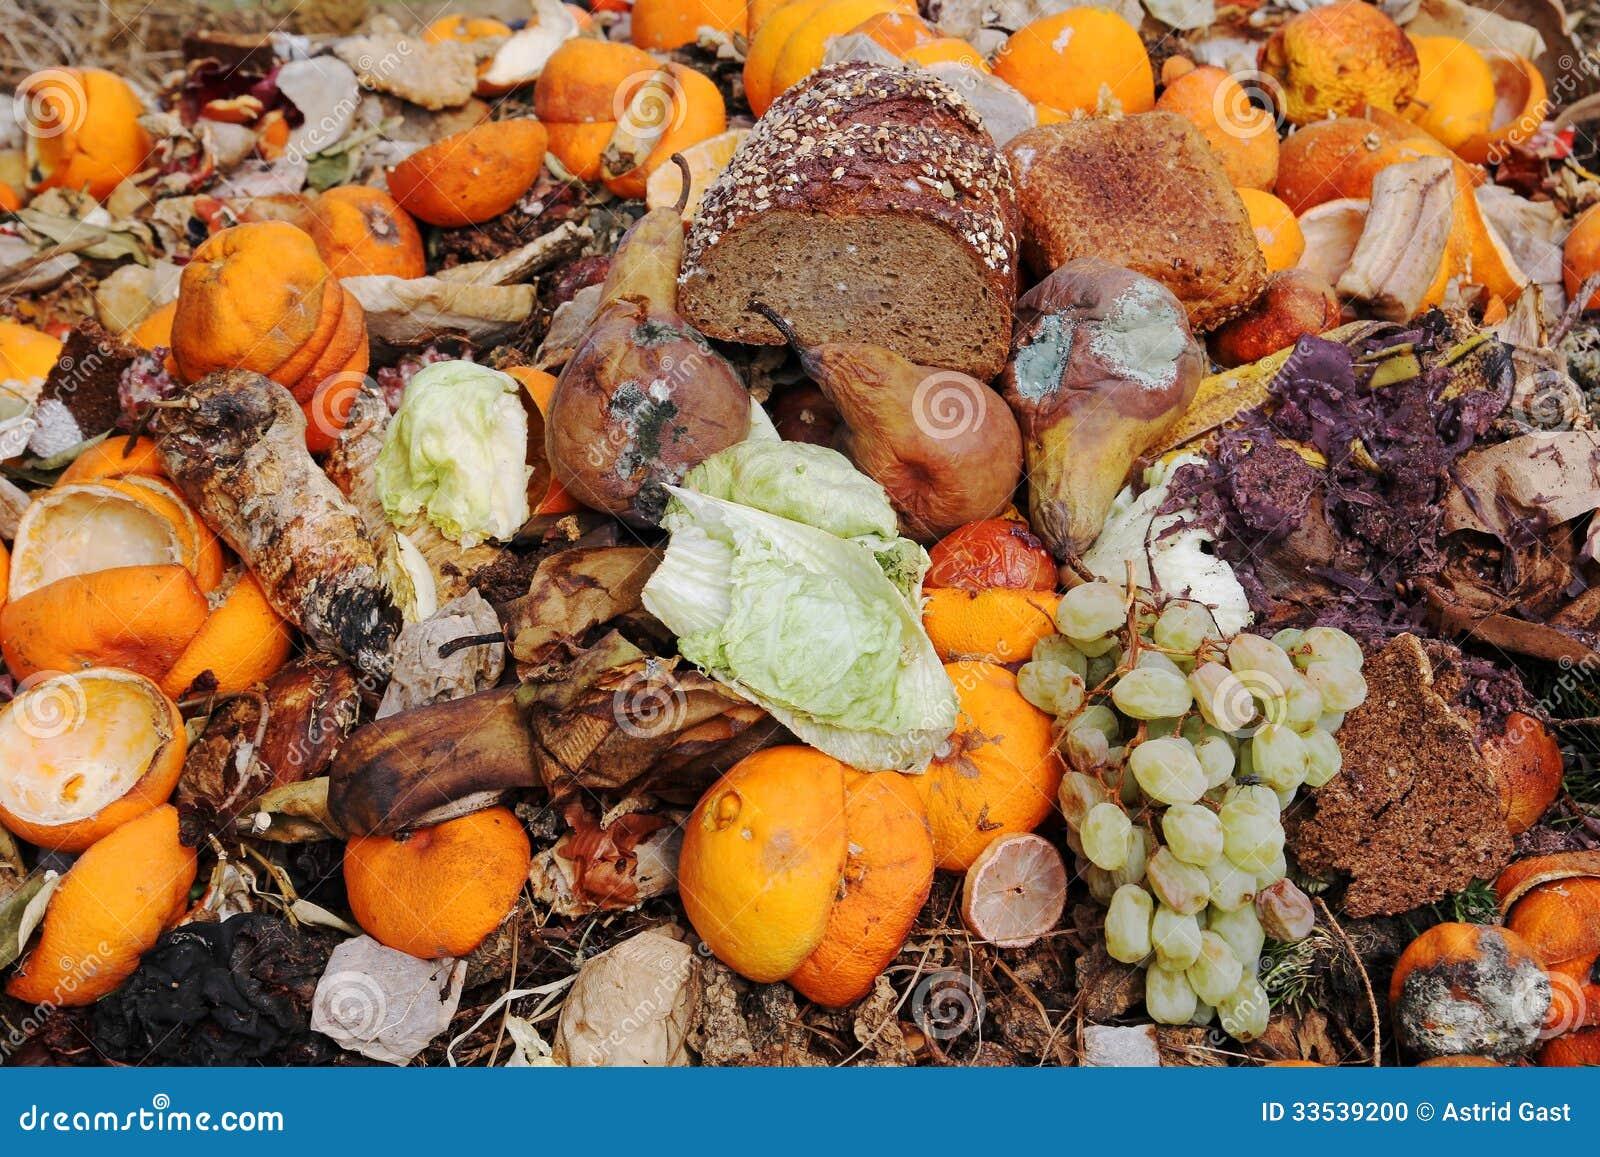 organic waste more rotting more rotting drop garbage heap 33539200